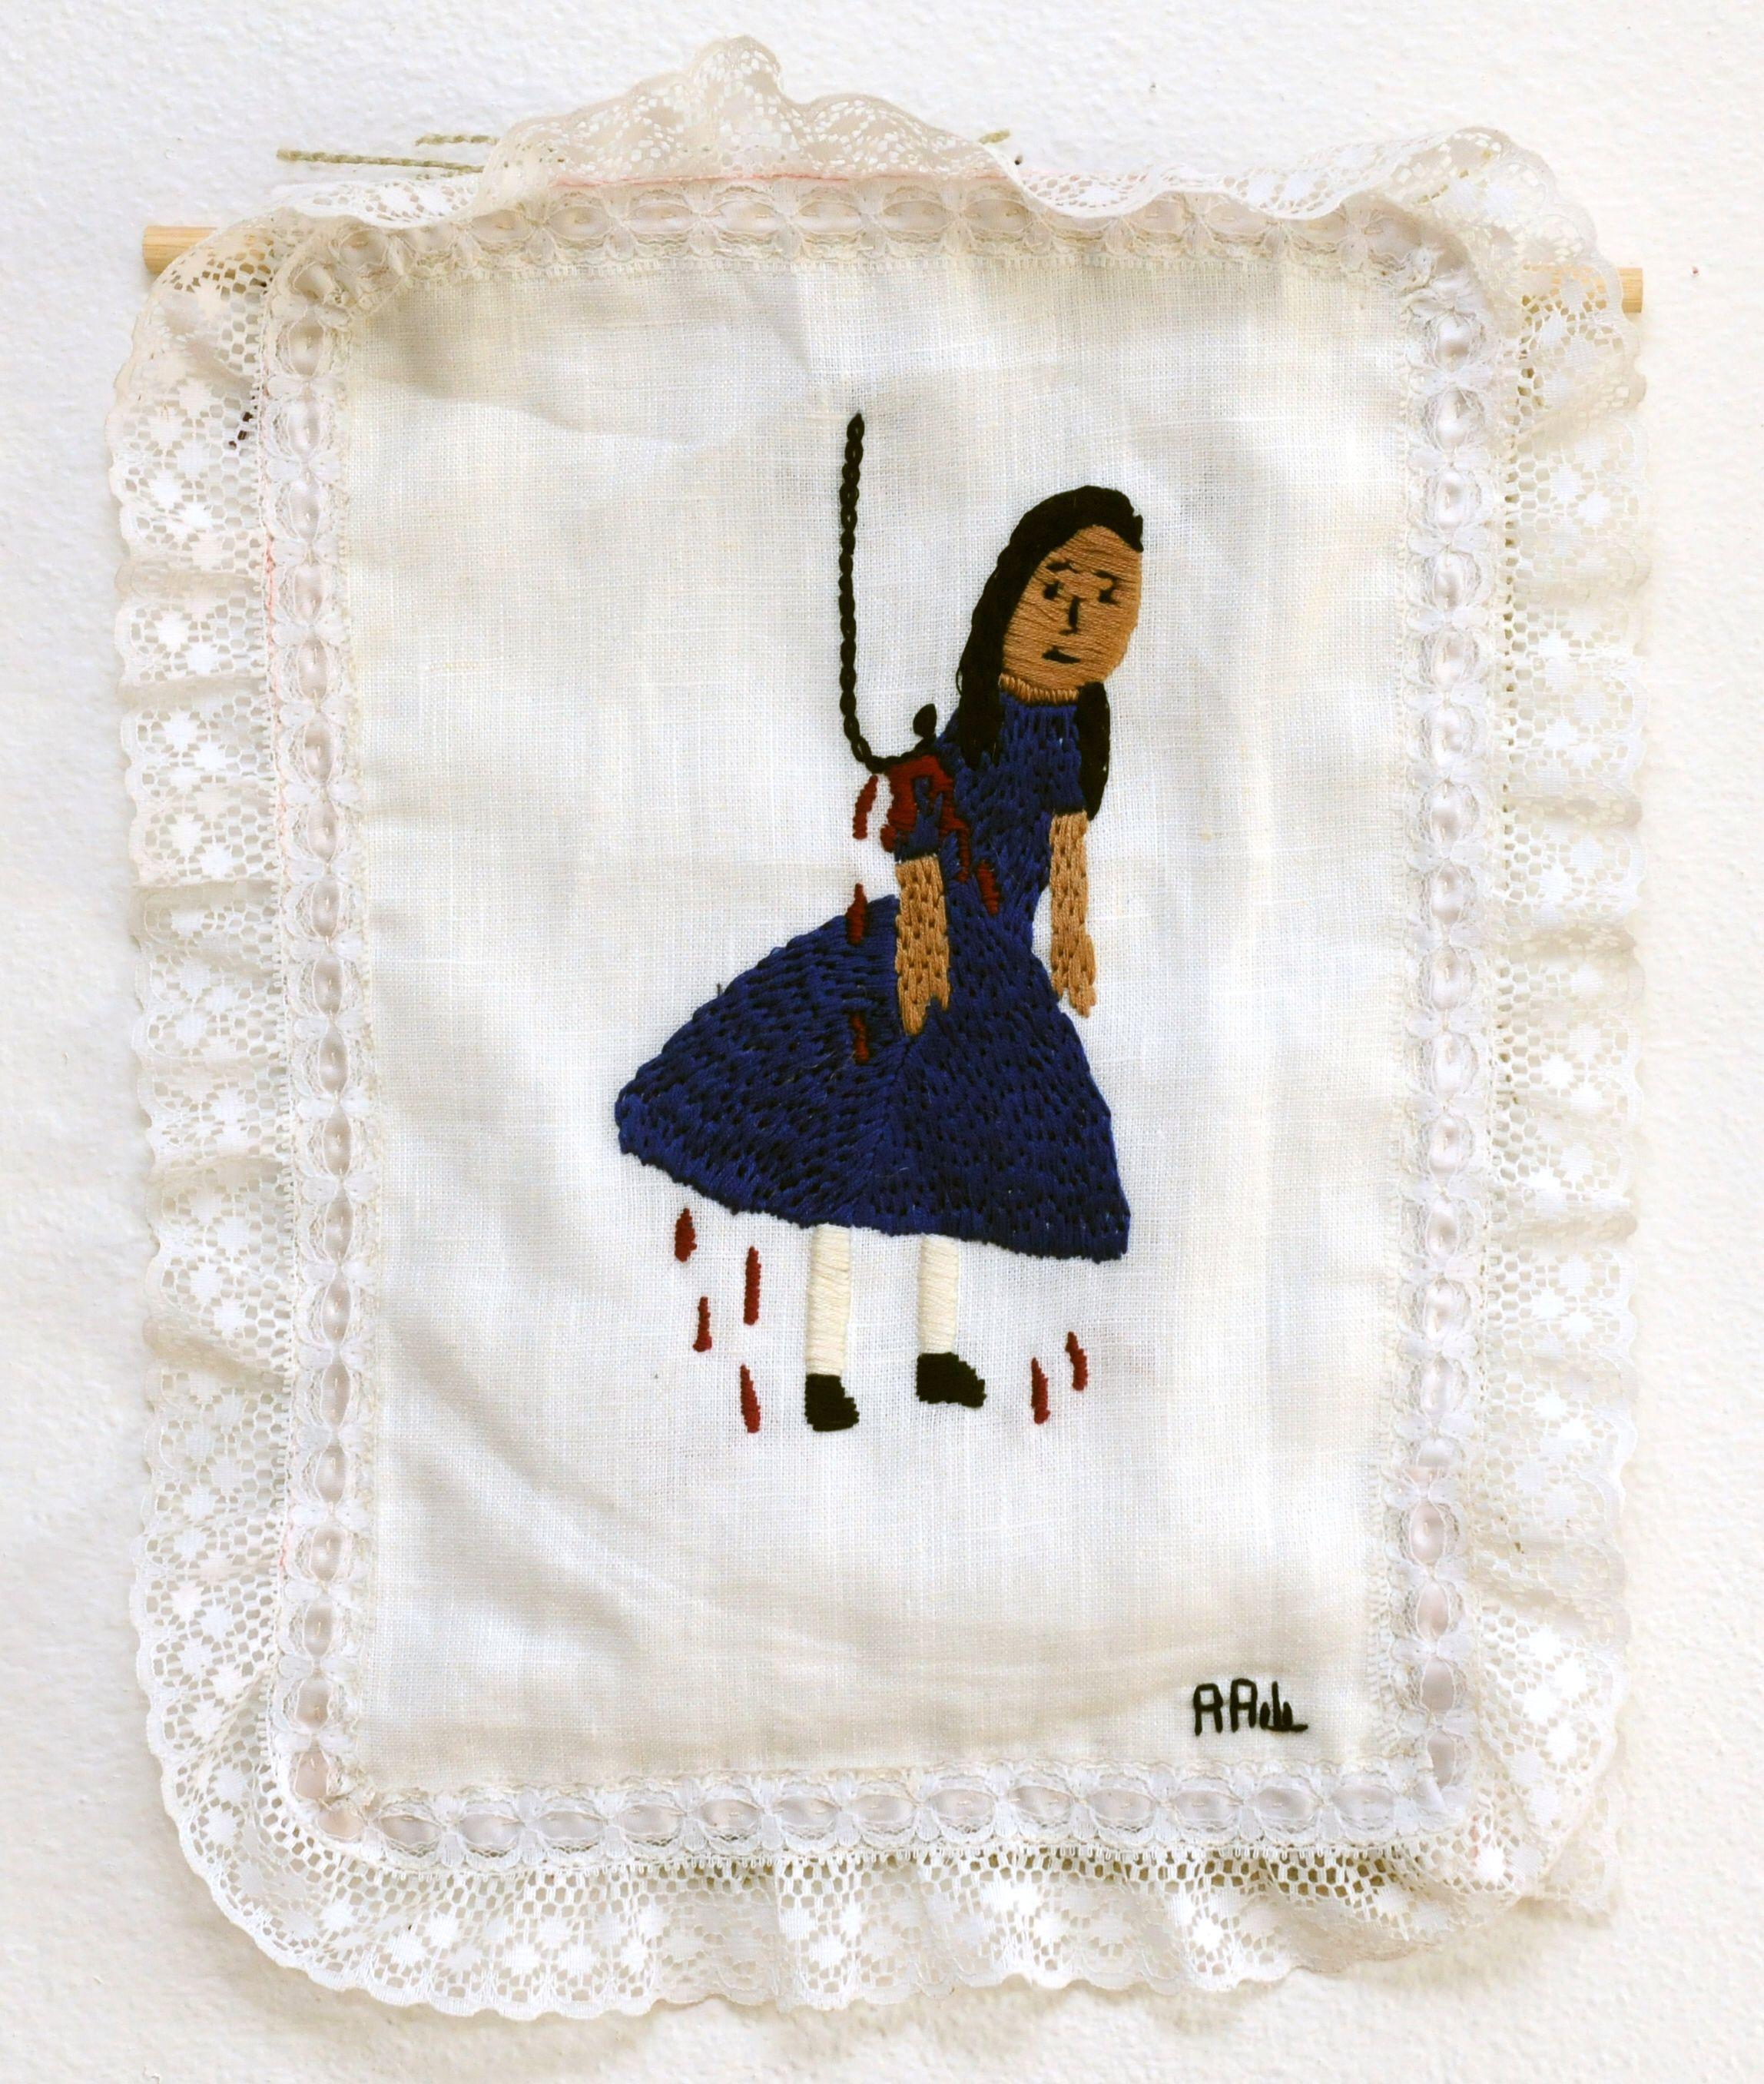 Innana, 2007, by Annie Aube, hand embroidery, www.annieaube.com